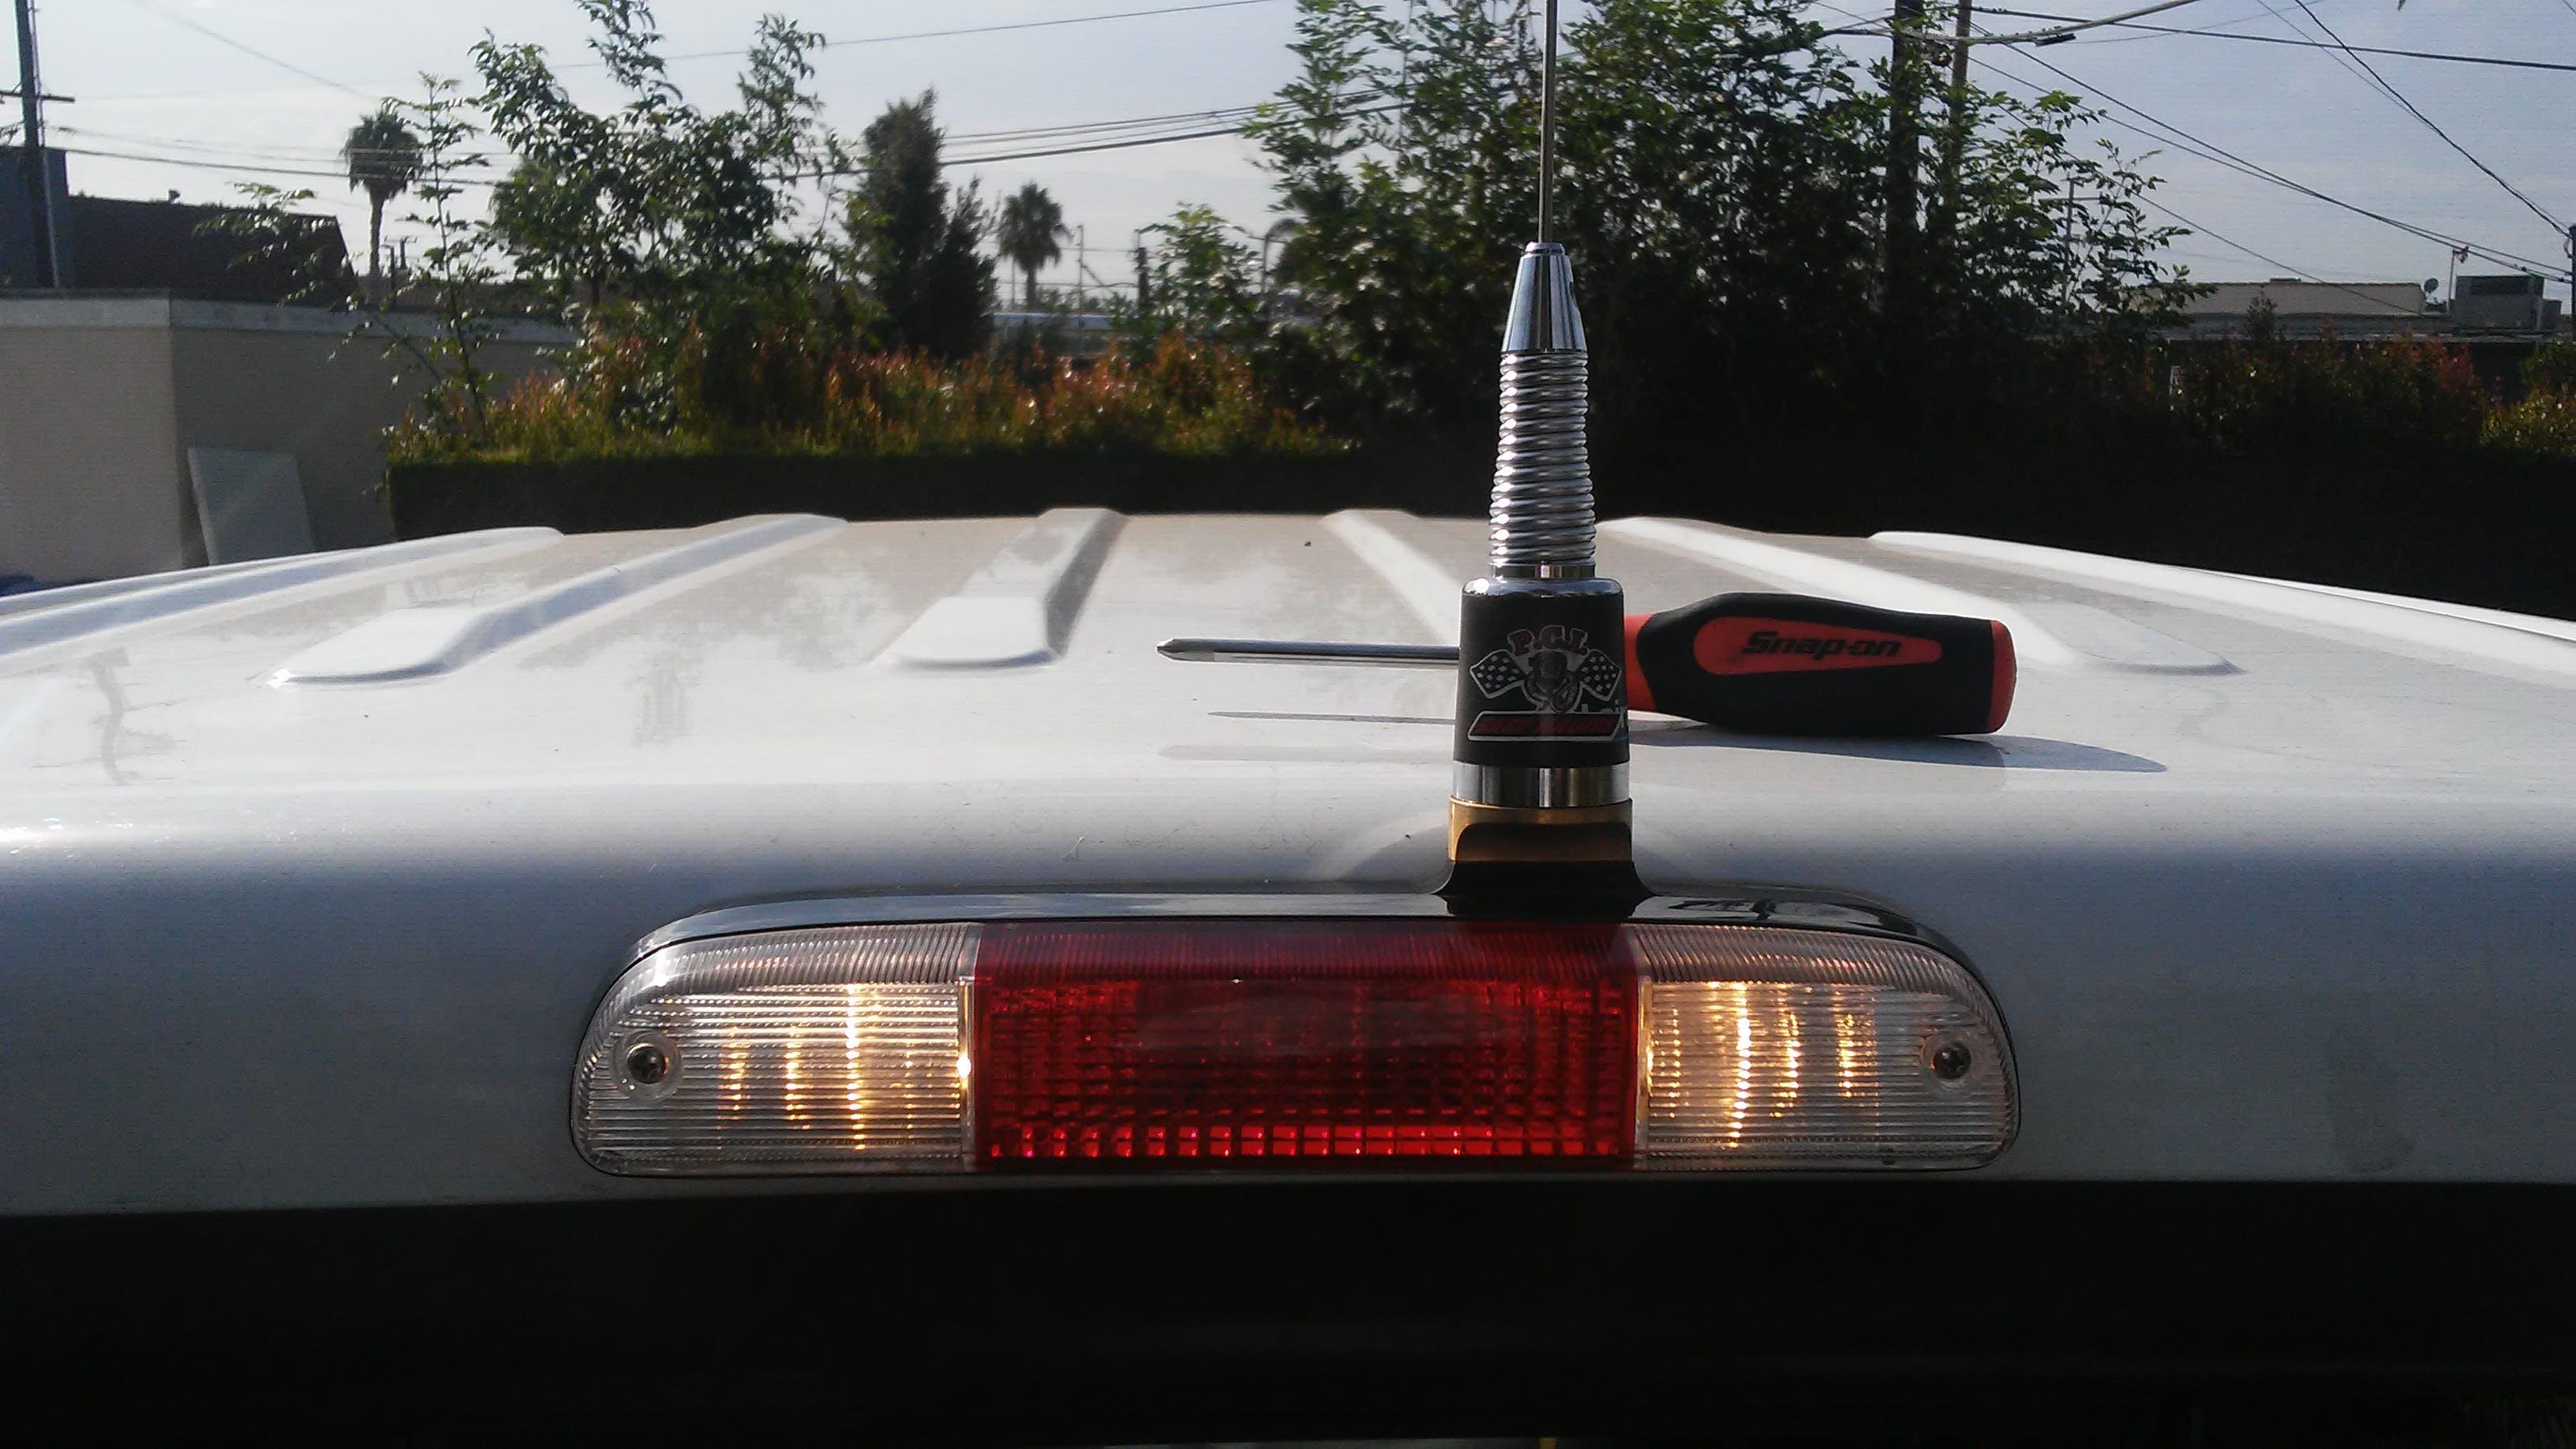 Brake Light Antenna Mount Pci Race Radios